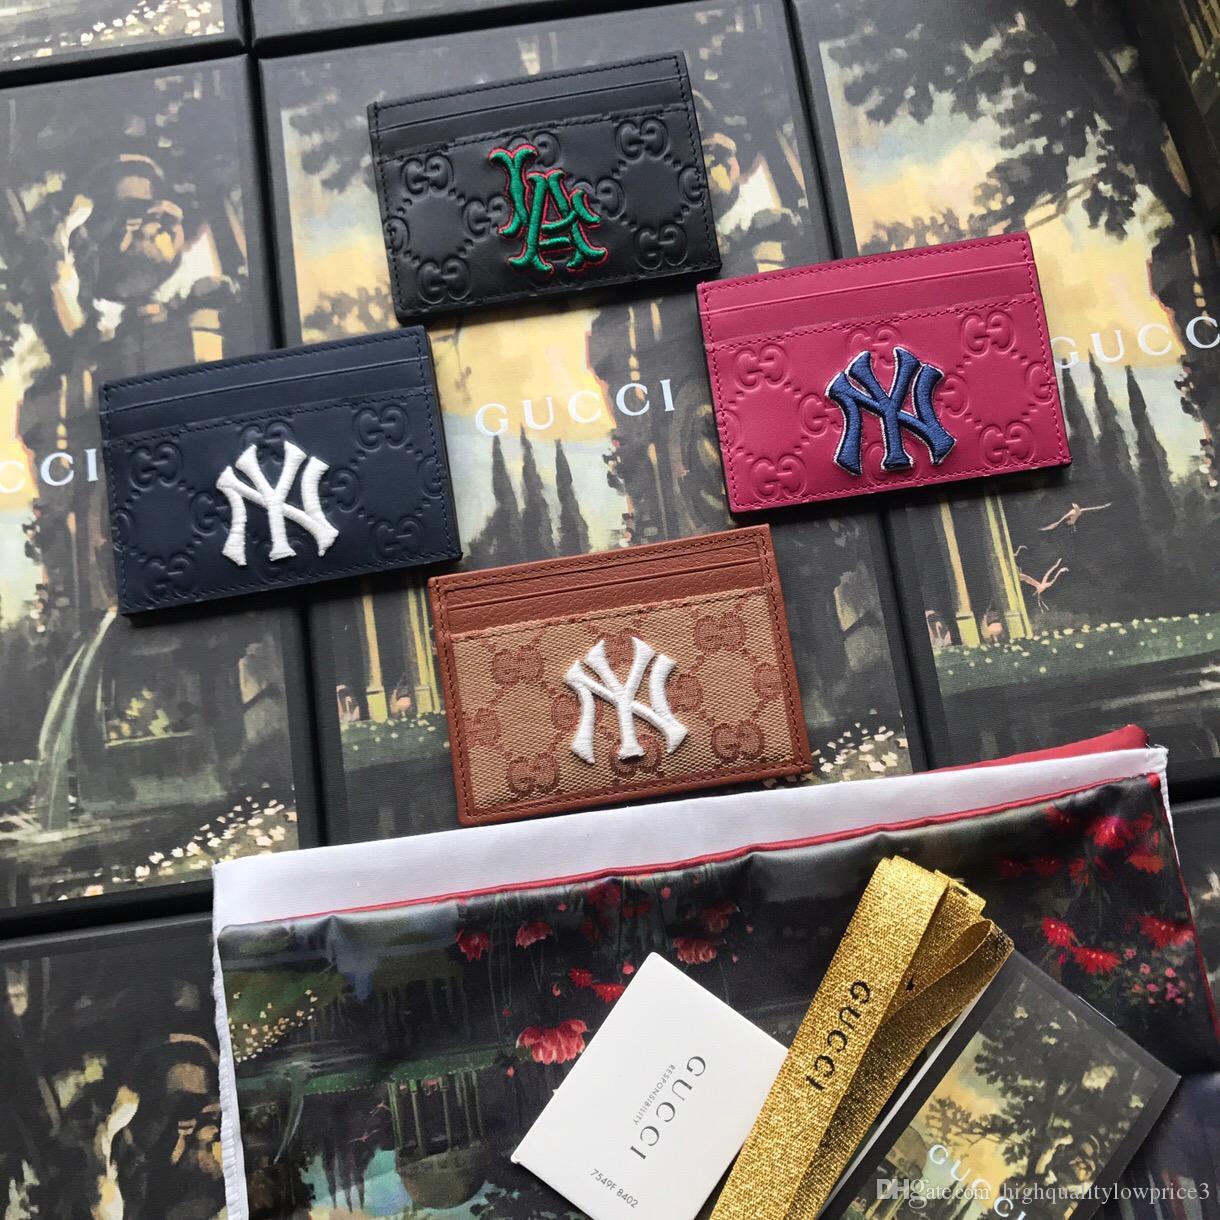 cc4f9bae7f2 Classic Ltter Black Men Wallet With Box Genuine Leather Small Purses Women  Card Holder 547793 Designer Leather Wallets Radley Card Holder From ...